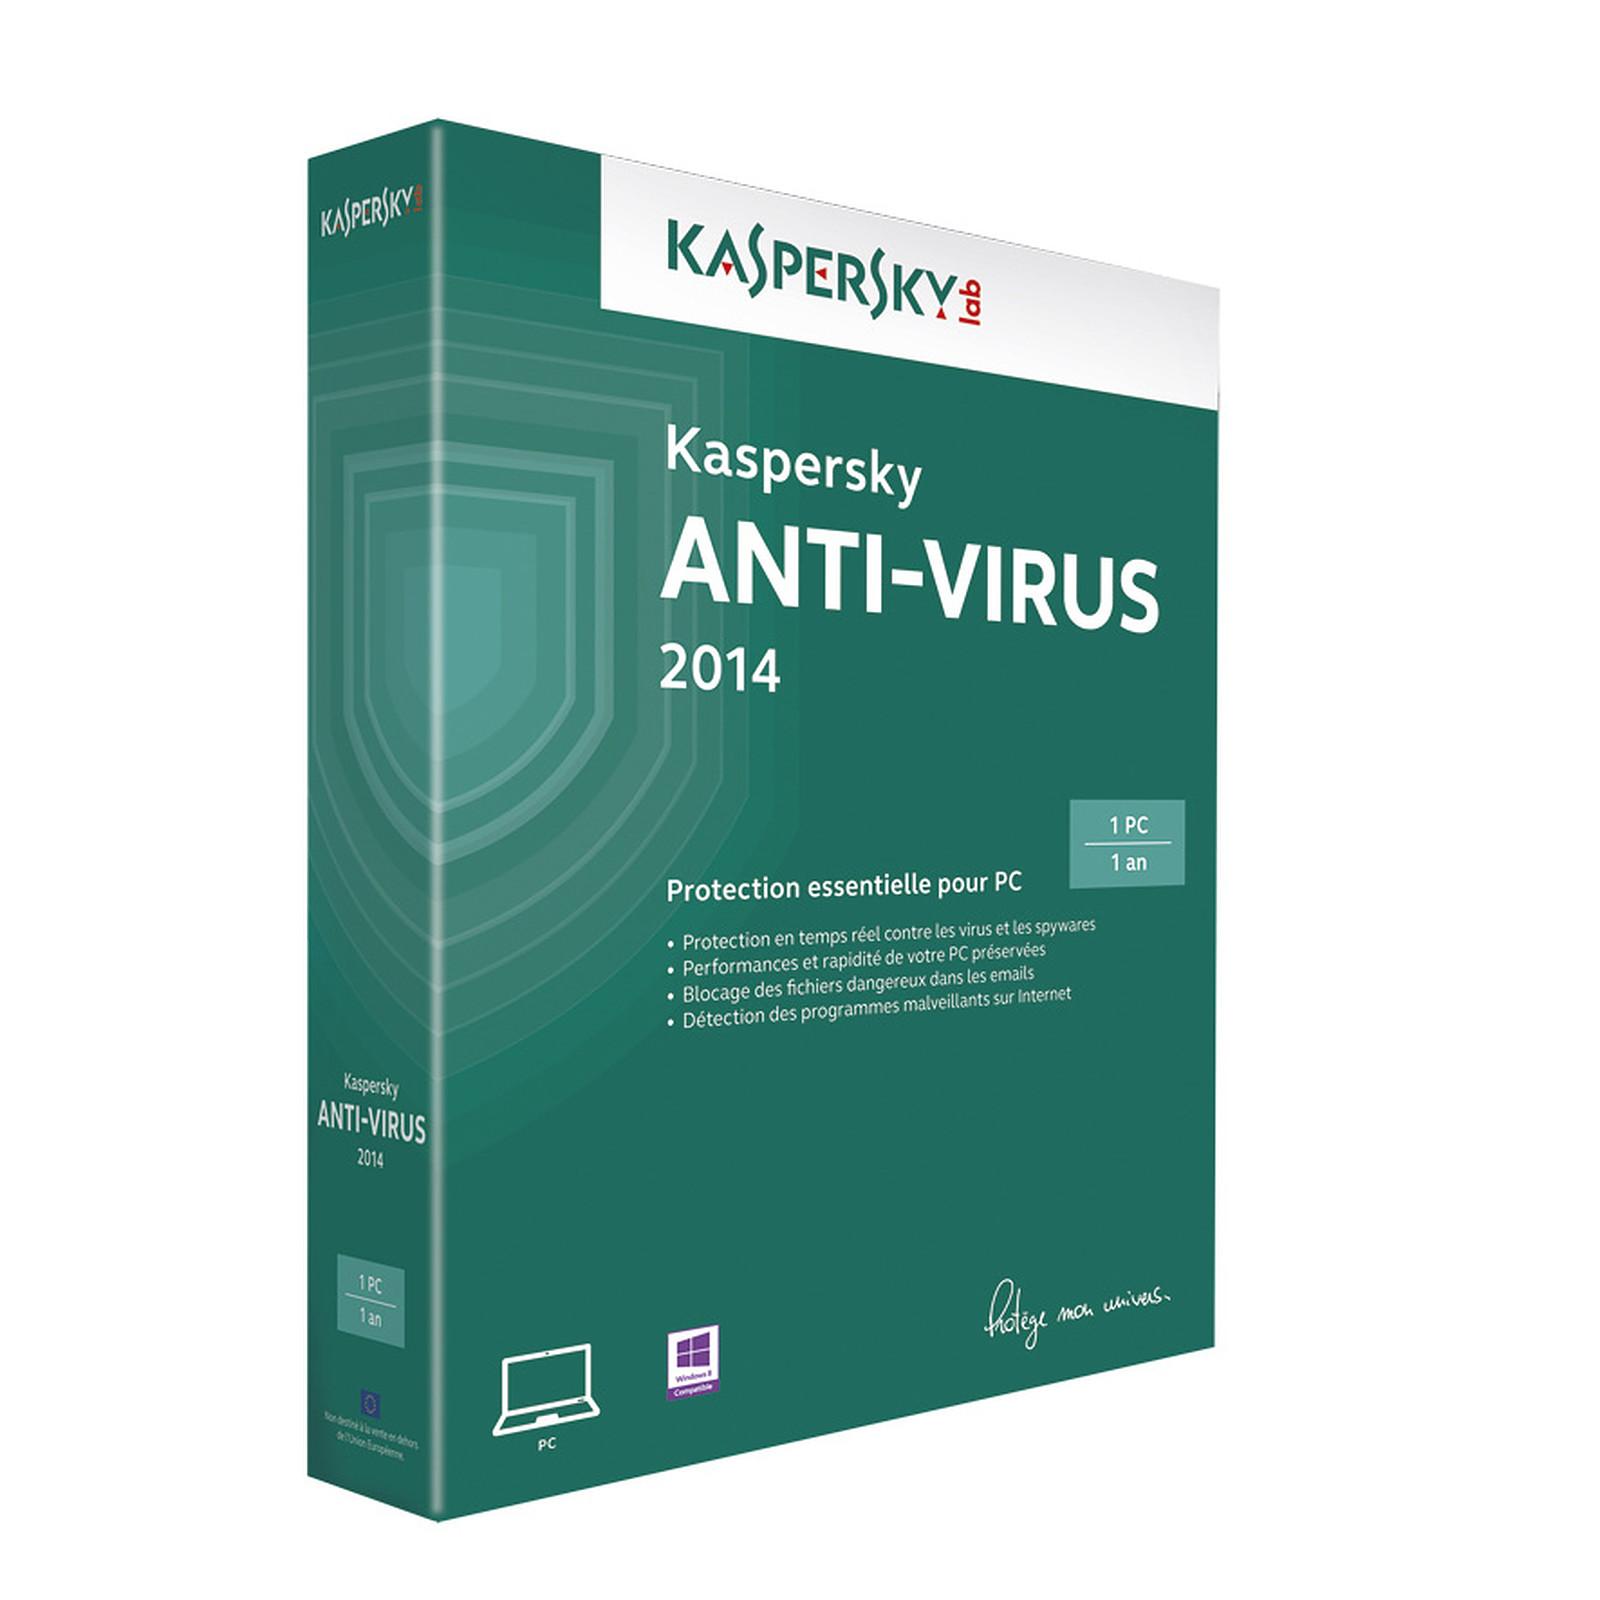 Kaspersky Anti-Virus 2014 - Licence 1 poste 1 an (français, WINDOWS)